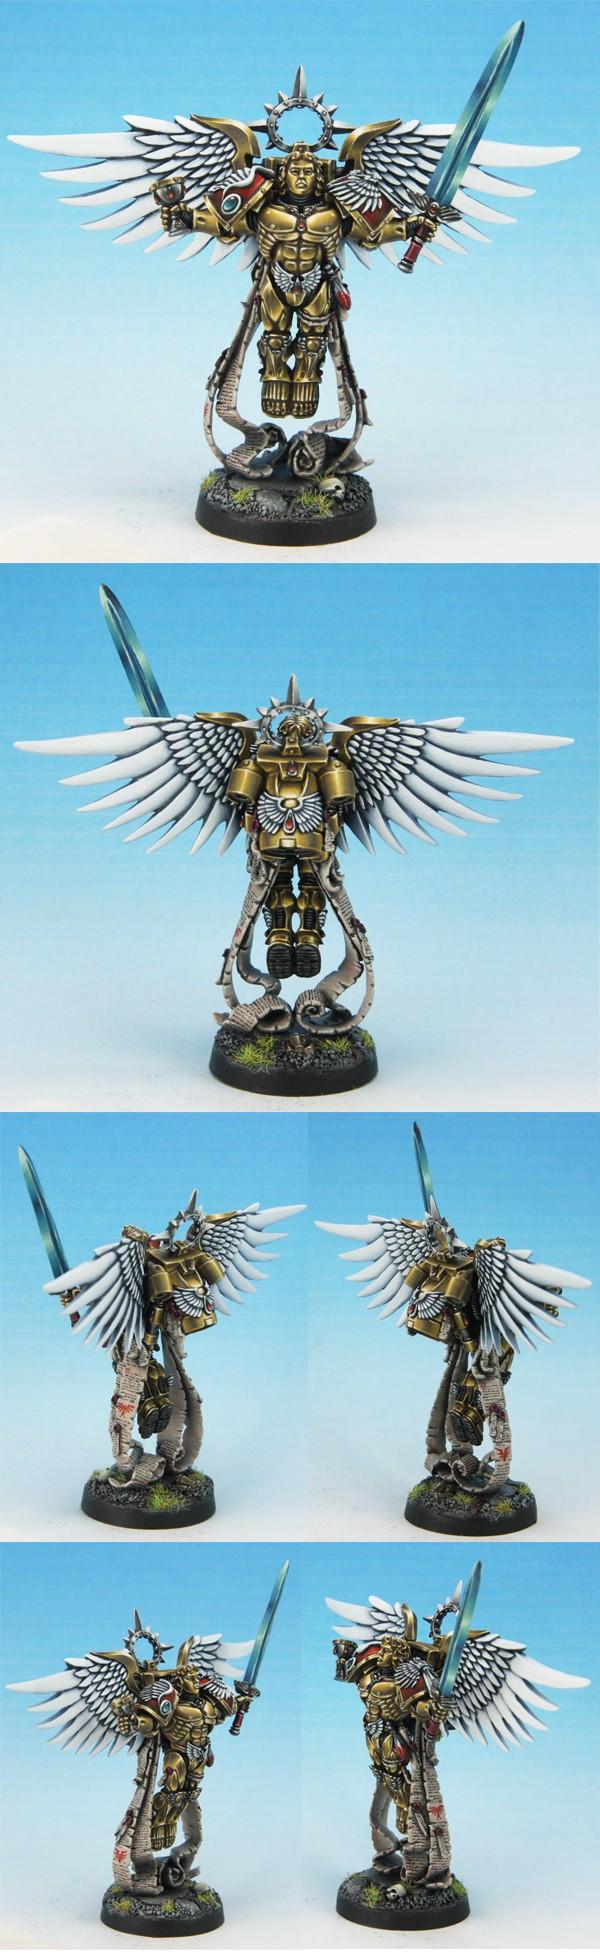 Blood Angels - The Sanguinor